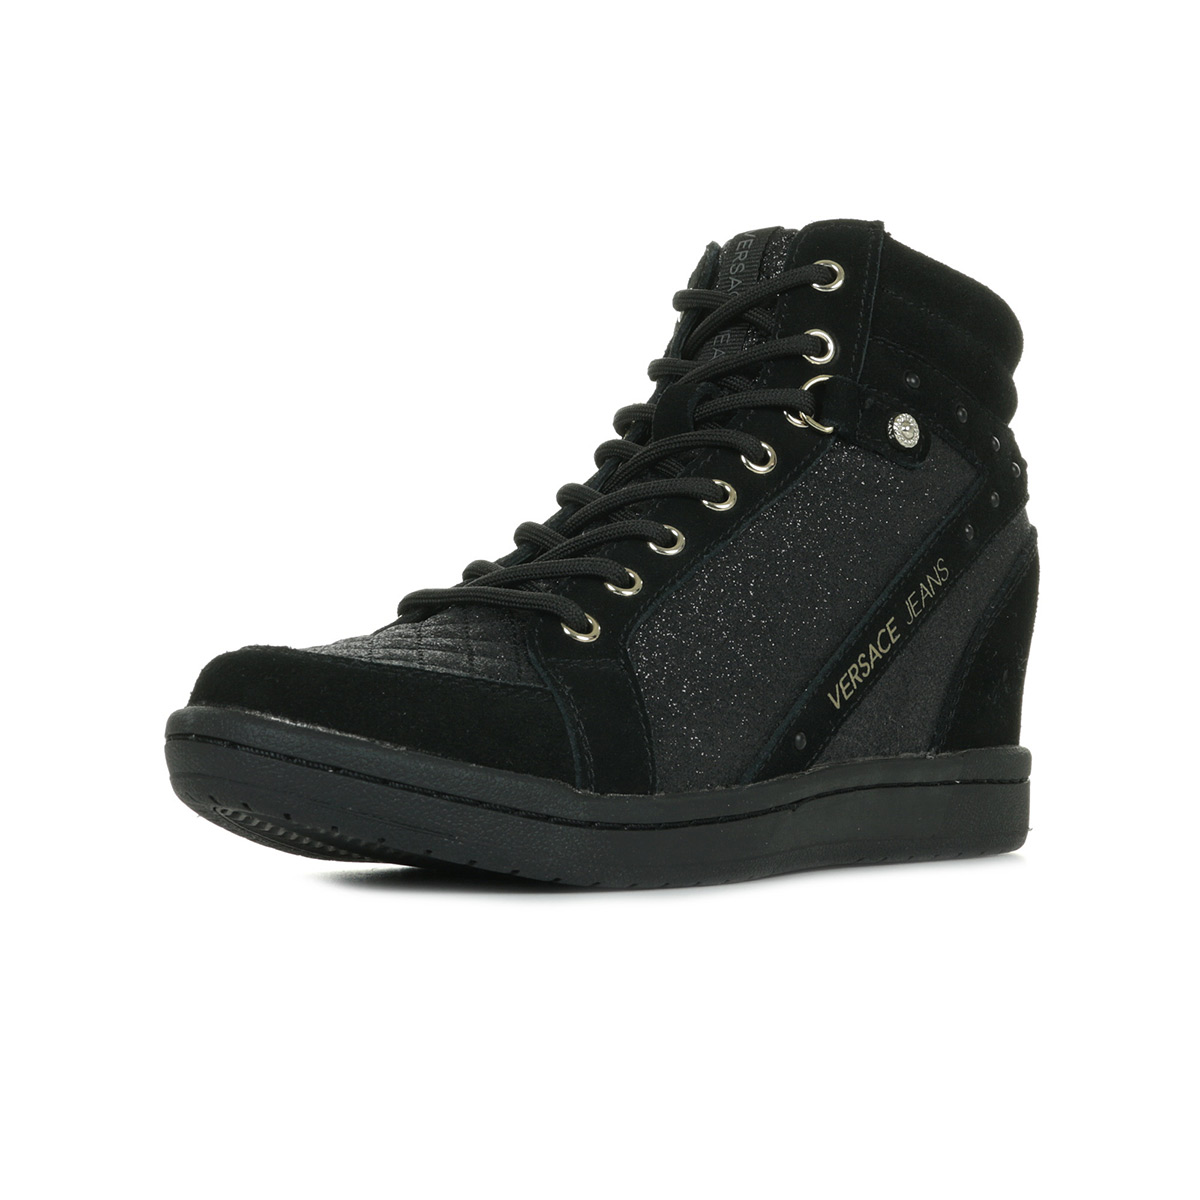 Versace Jeans Linea Fondo Wedge Dis. 1 E0VSBSB170735899, Baskets ... efc67548059